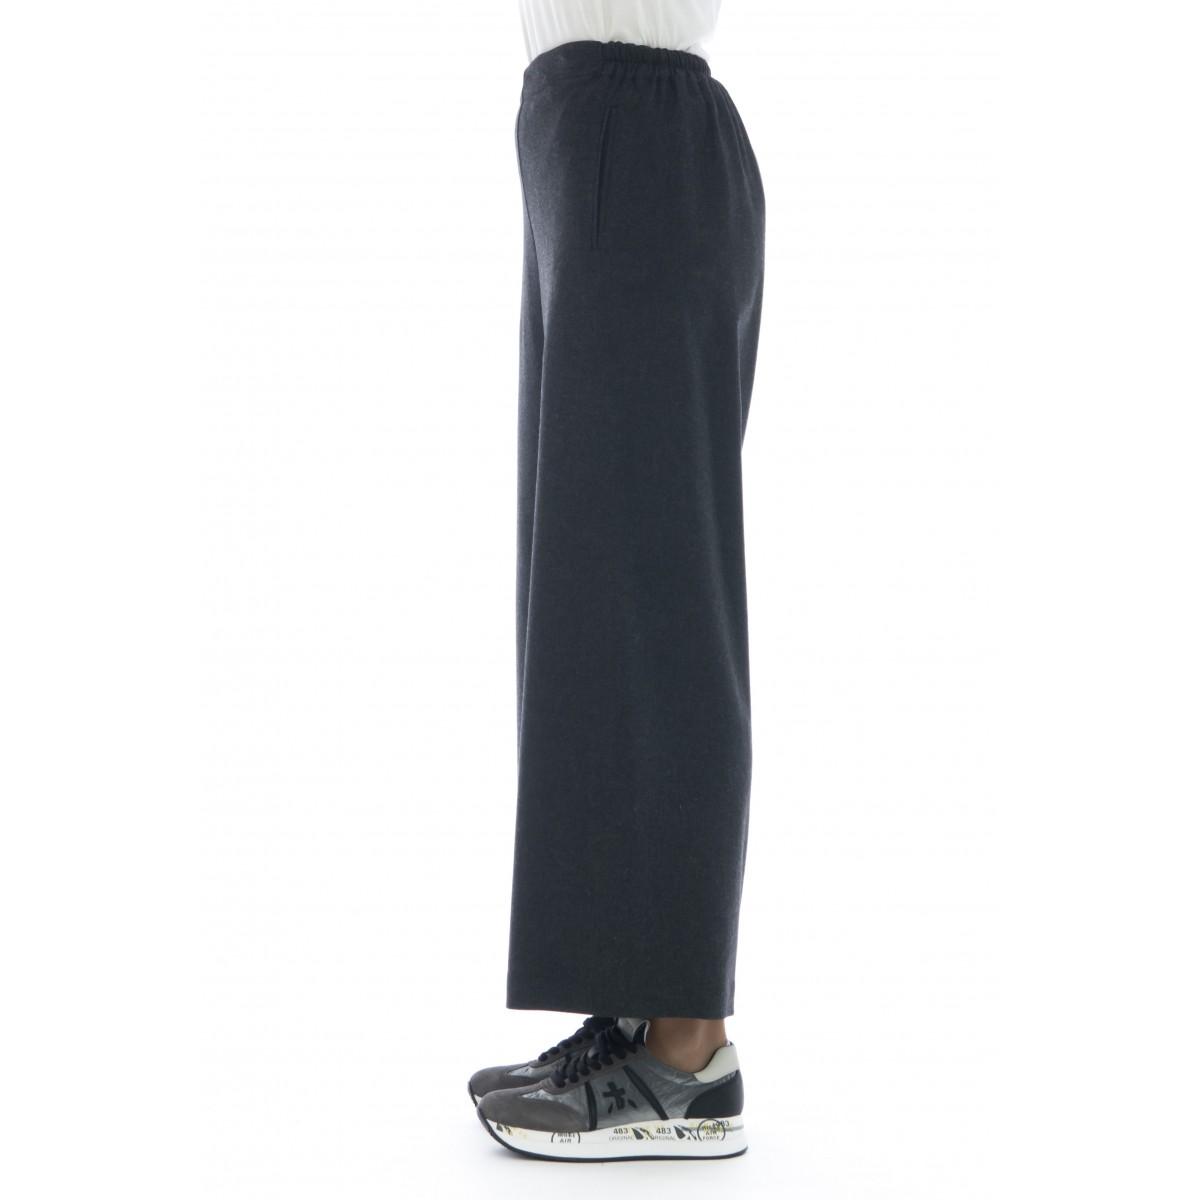 Pantalone donna - 210t48 pantalone lana